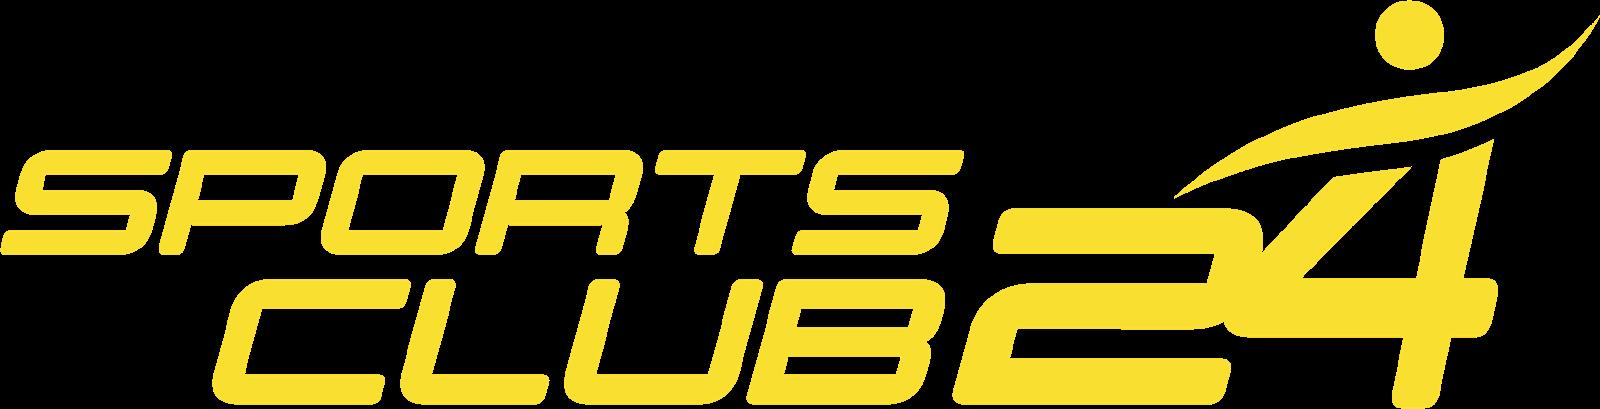 Sports Club 24